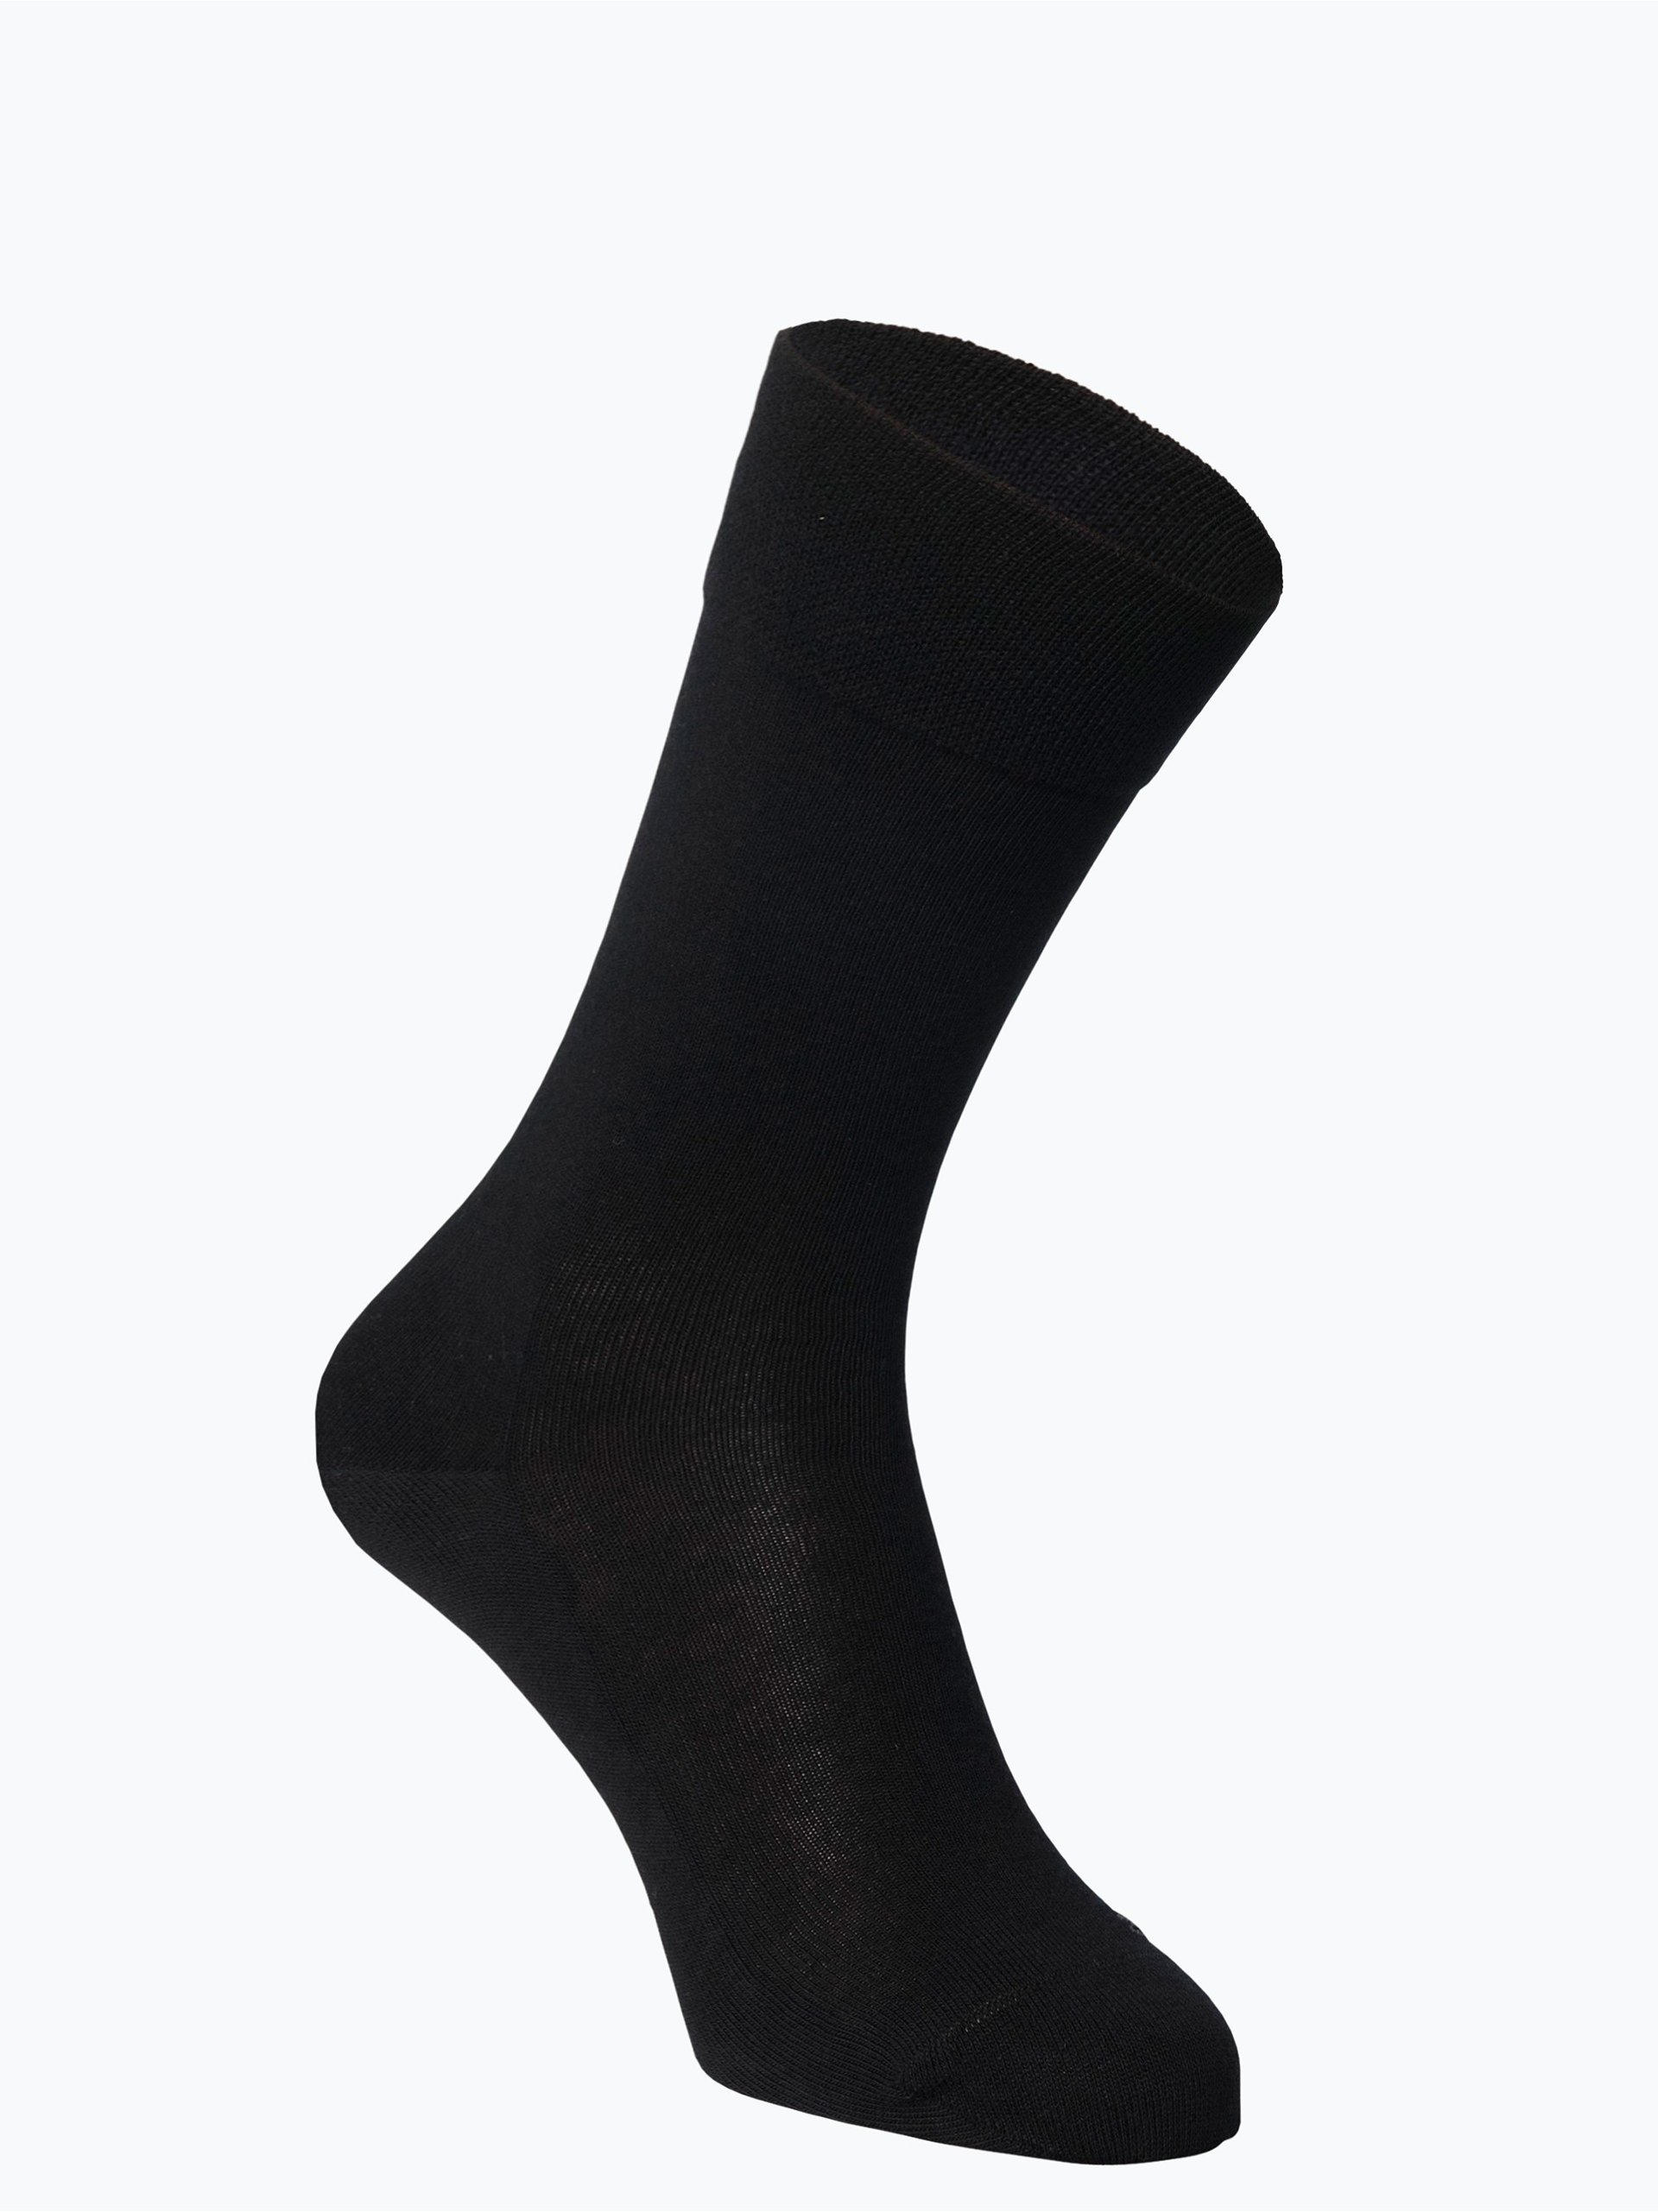 FALKE Herren Socken - Sensitive London